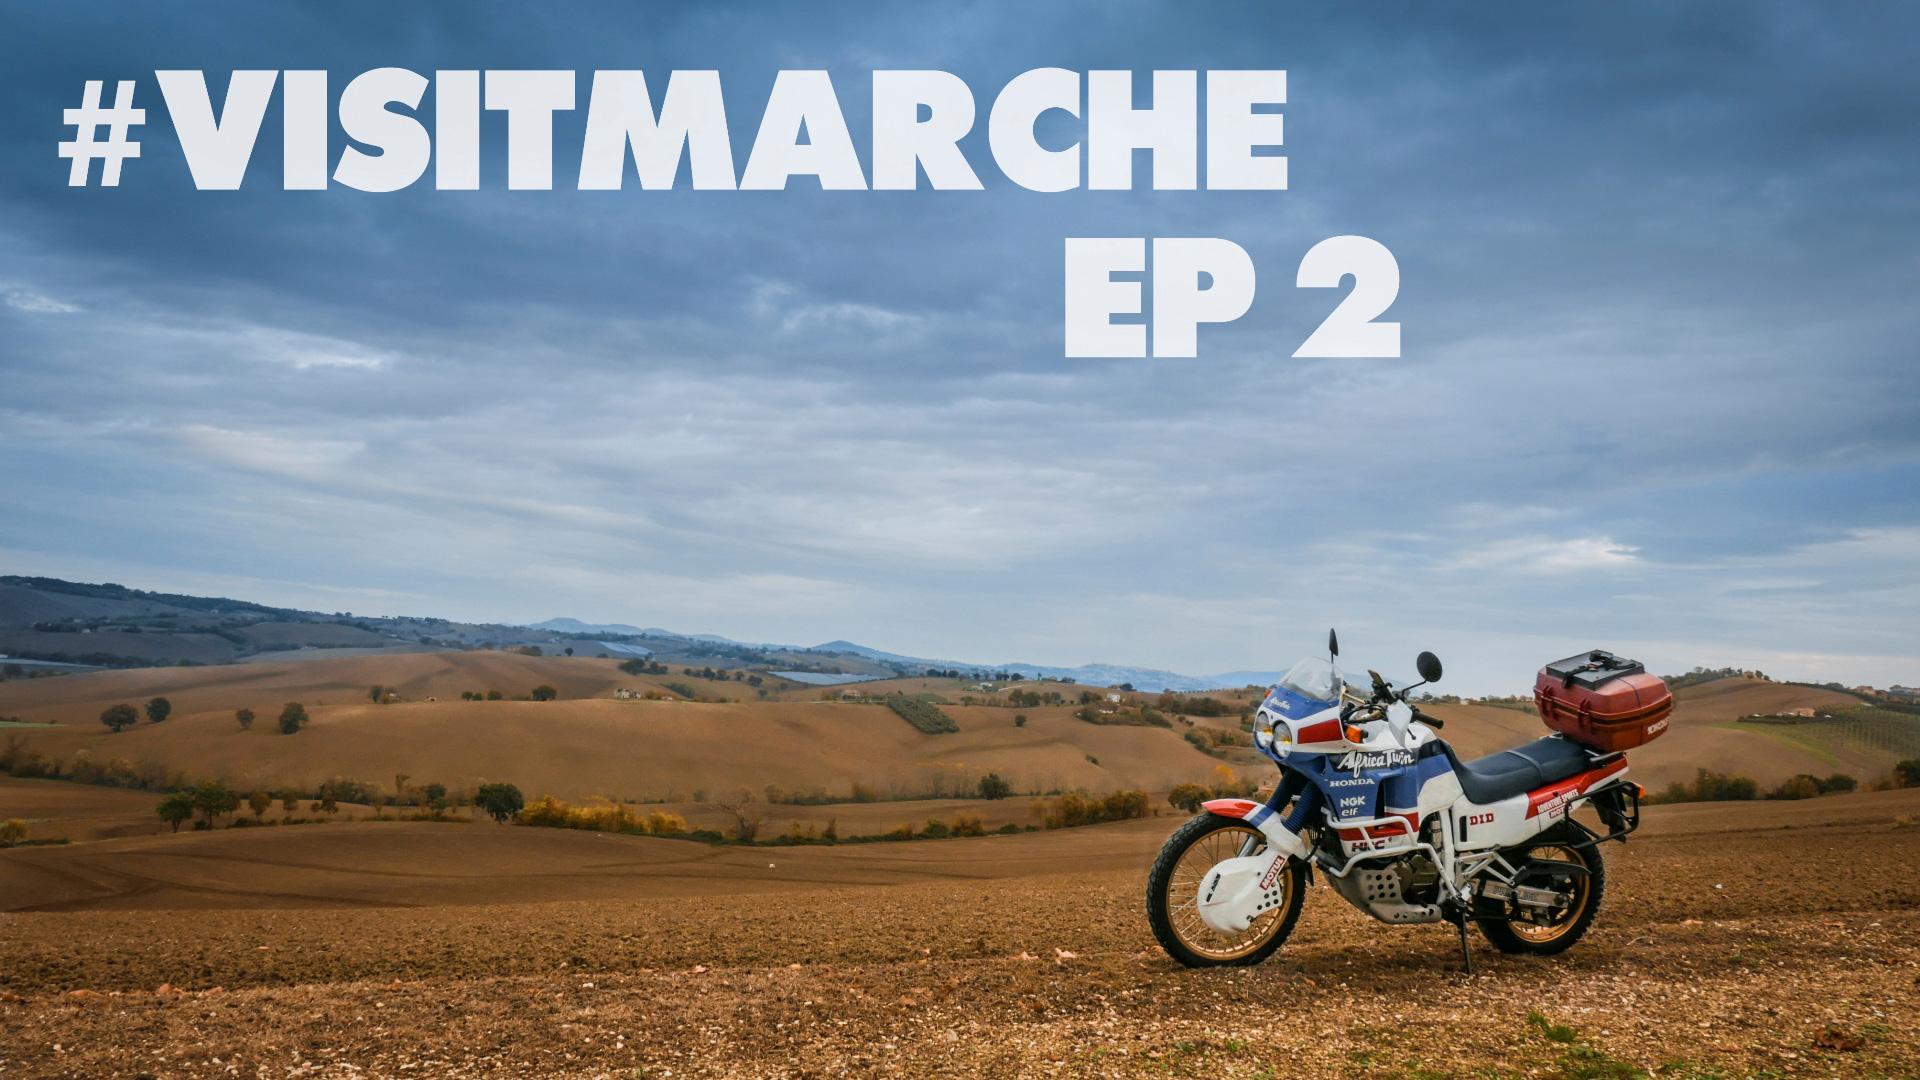 visitmarche episodio 2 visit marche